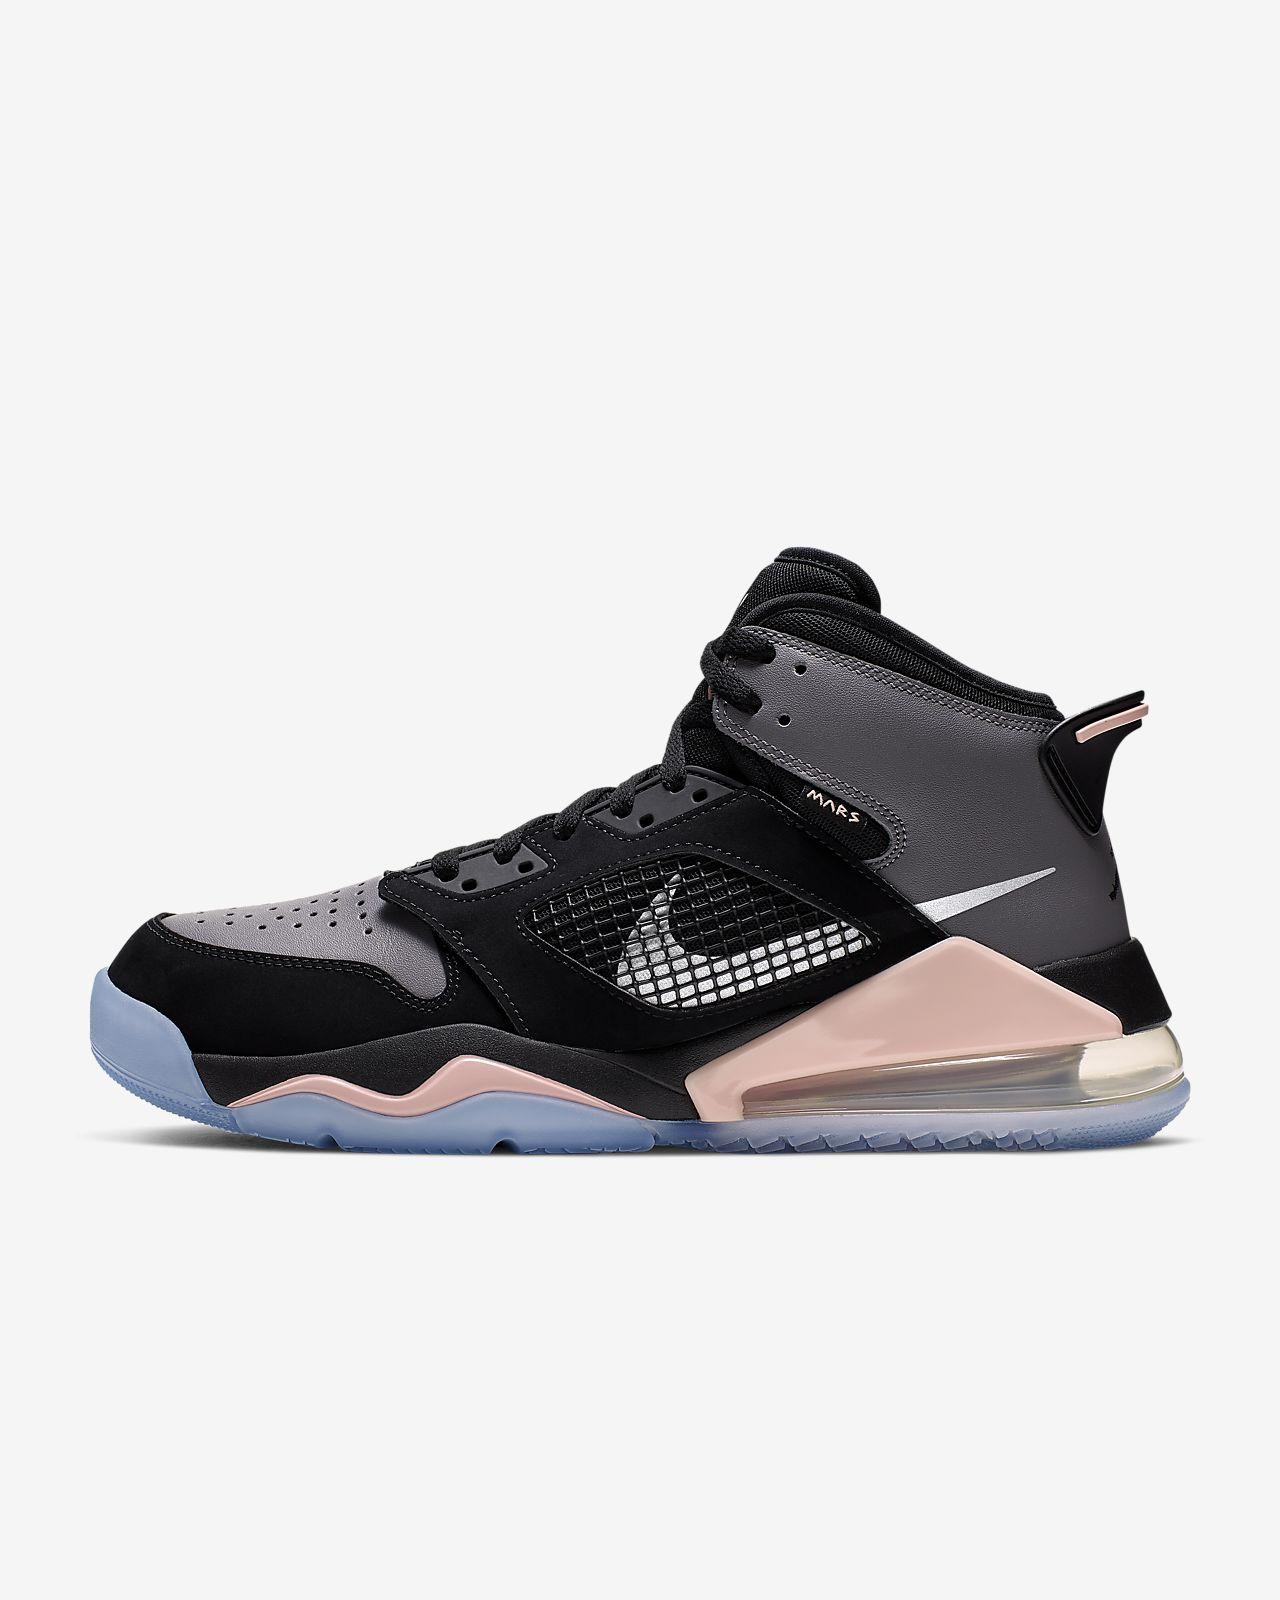 Jordan Mars 270 Men's Shoe. Nike SG